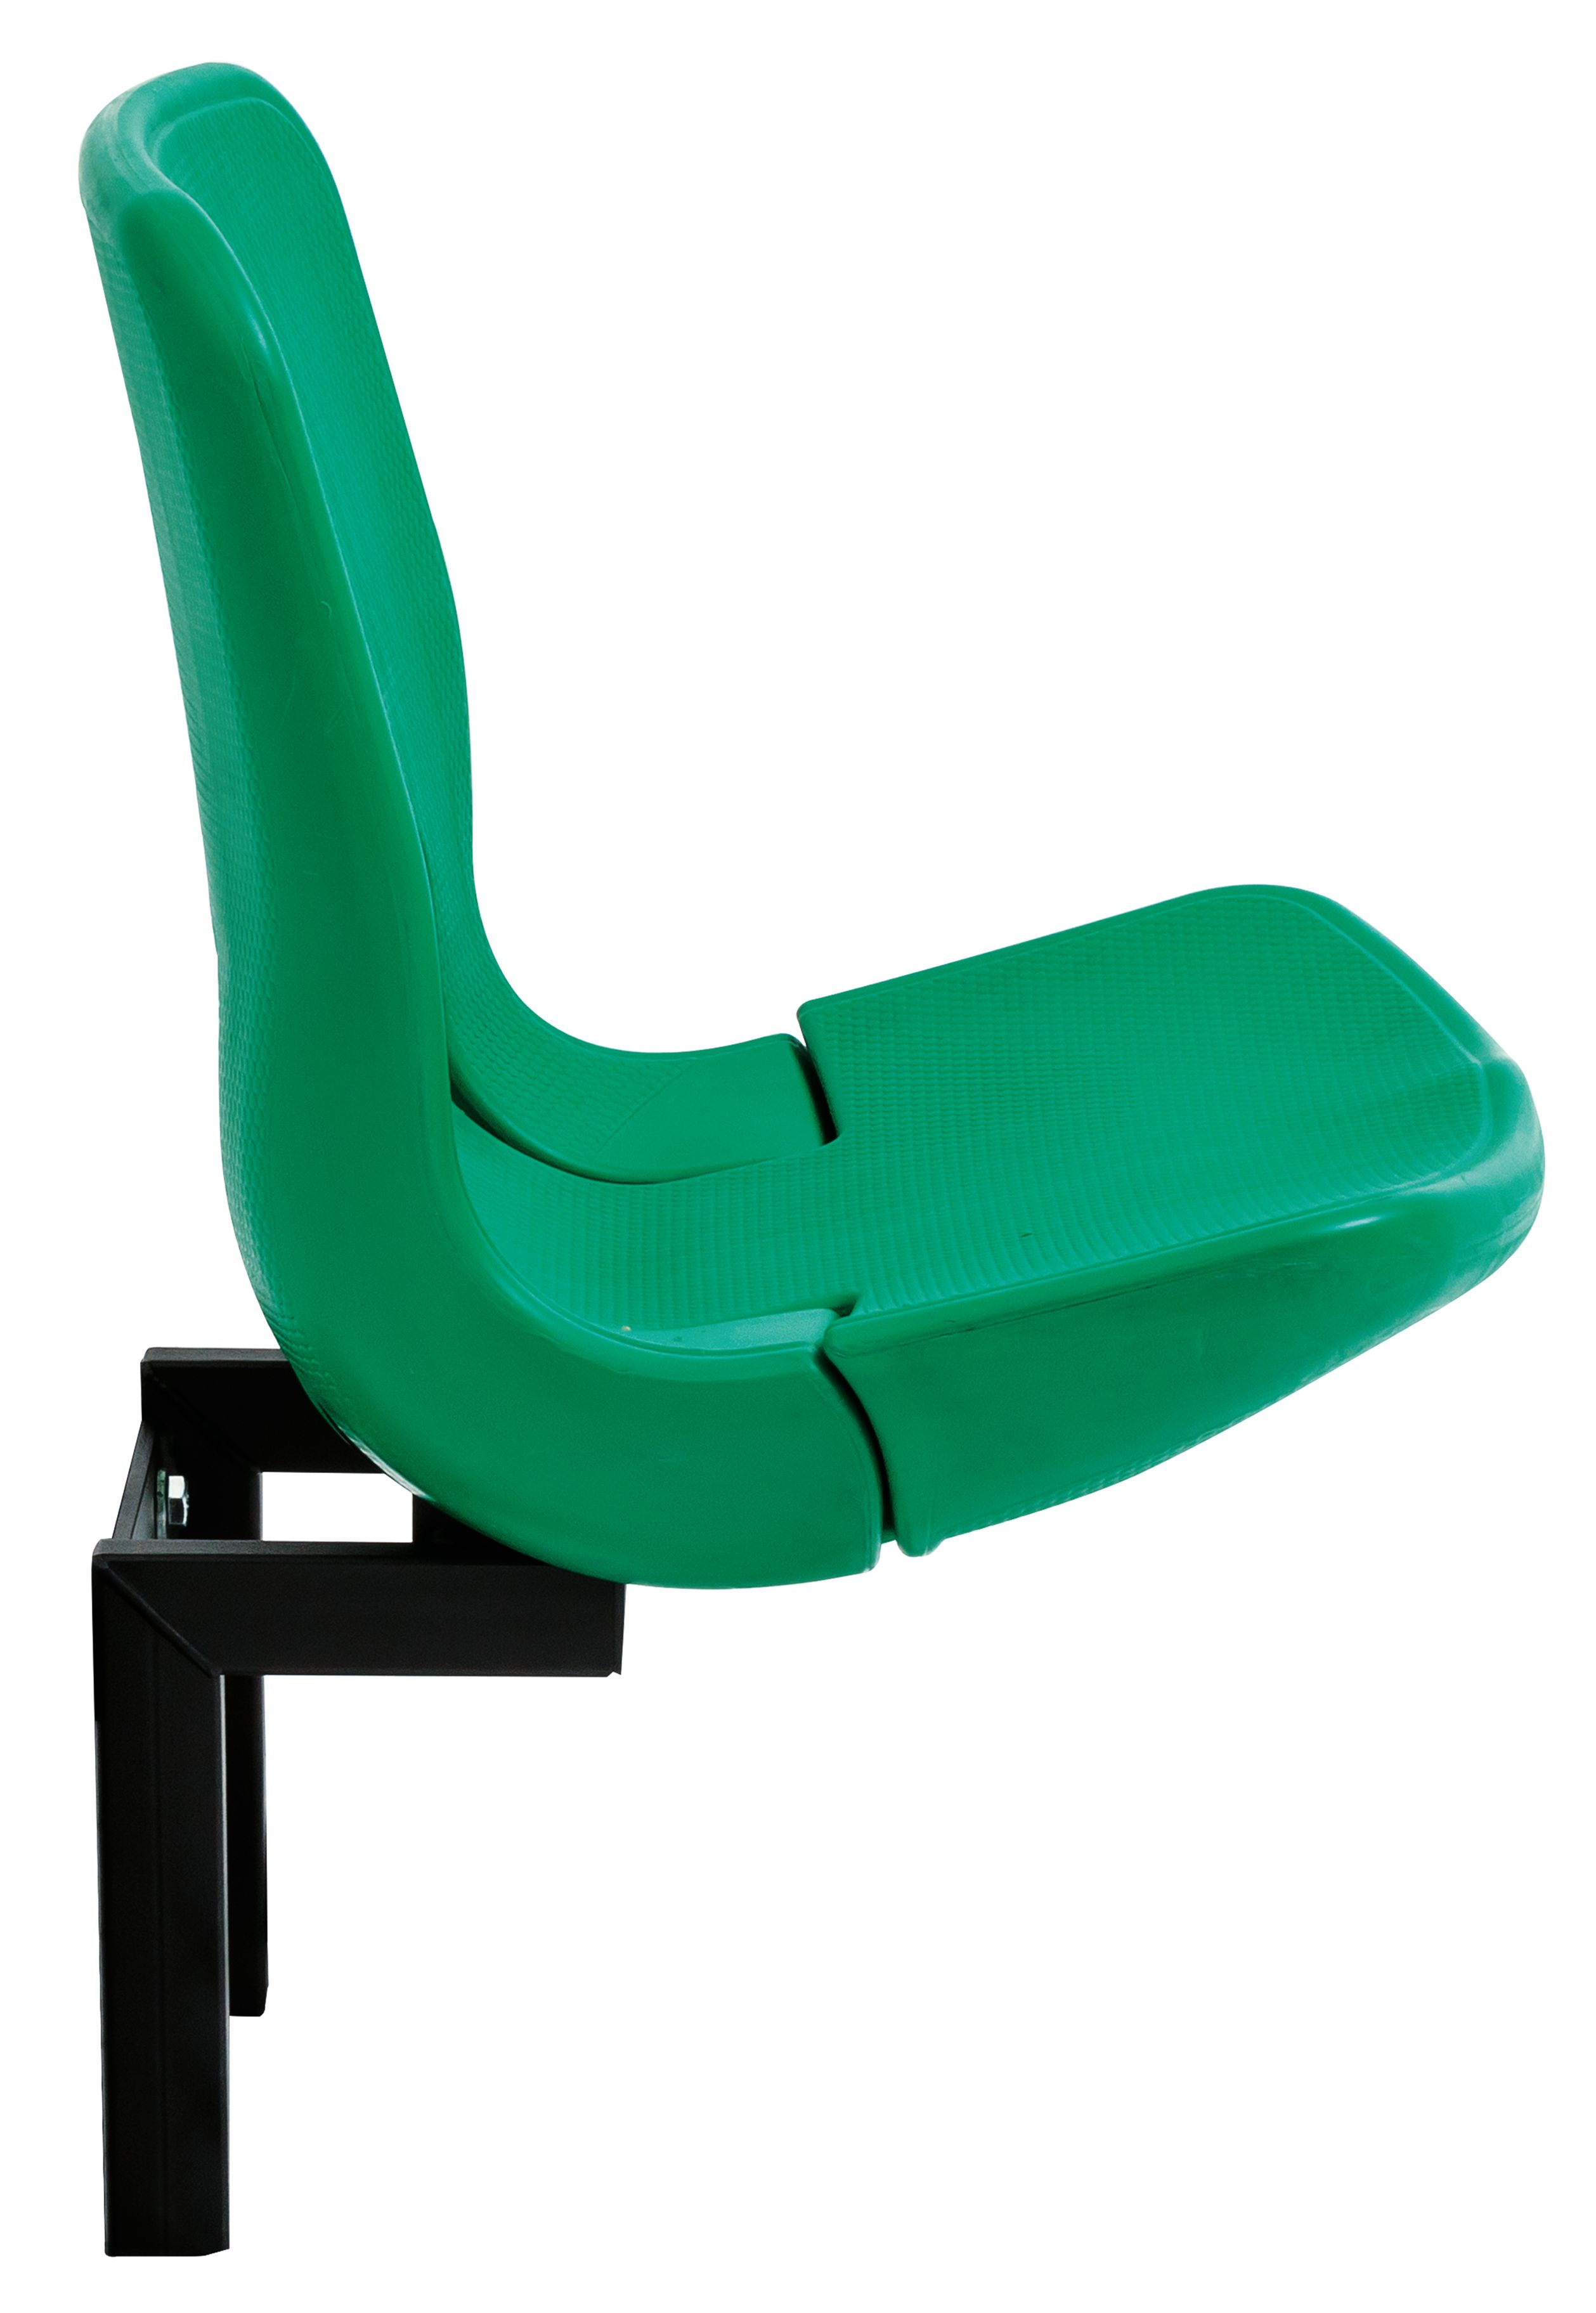 linea_backrest_monoblock_copolymer_pp_stadium_chair_seatorium_40